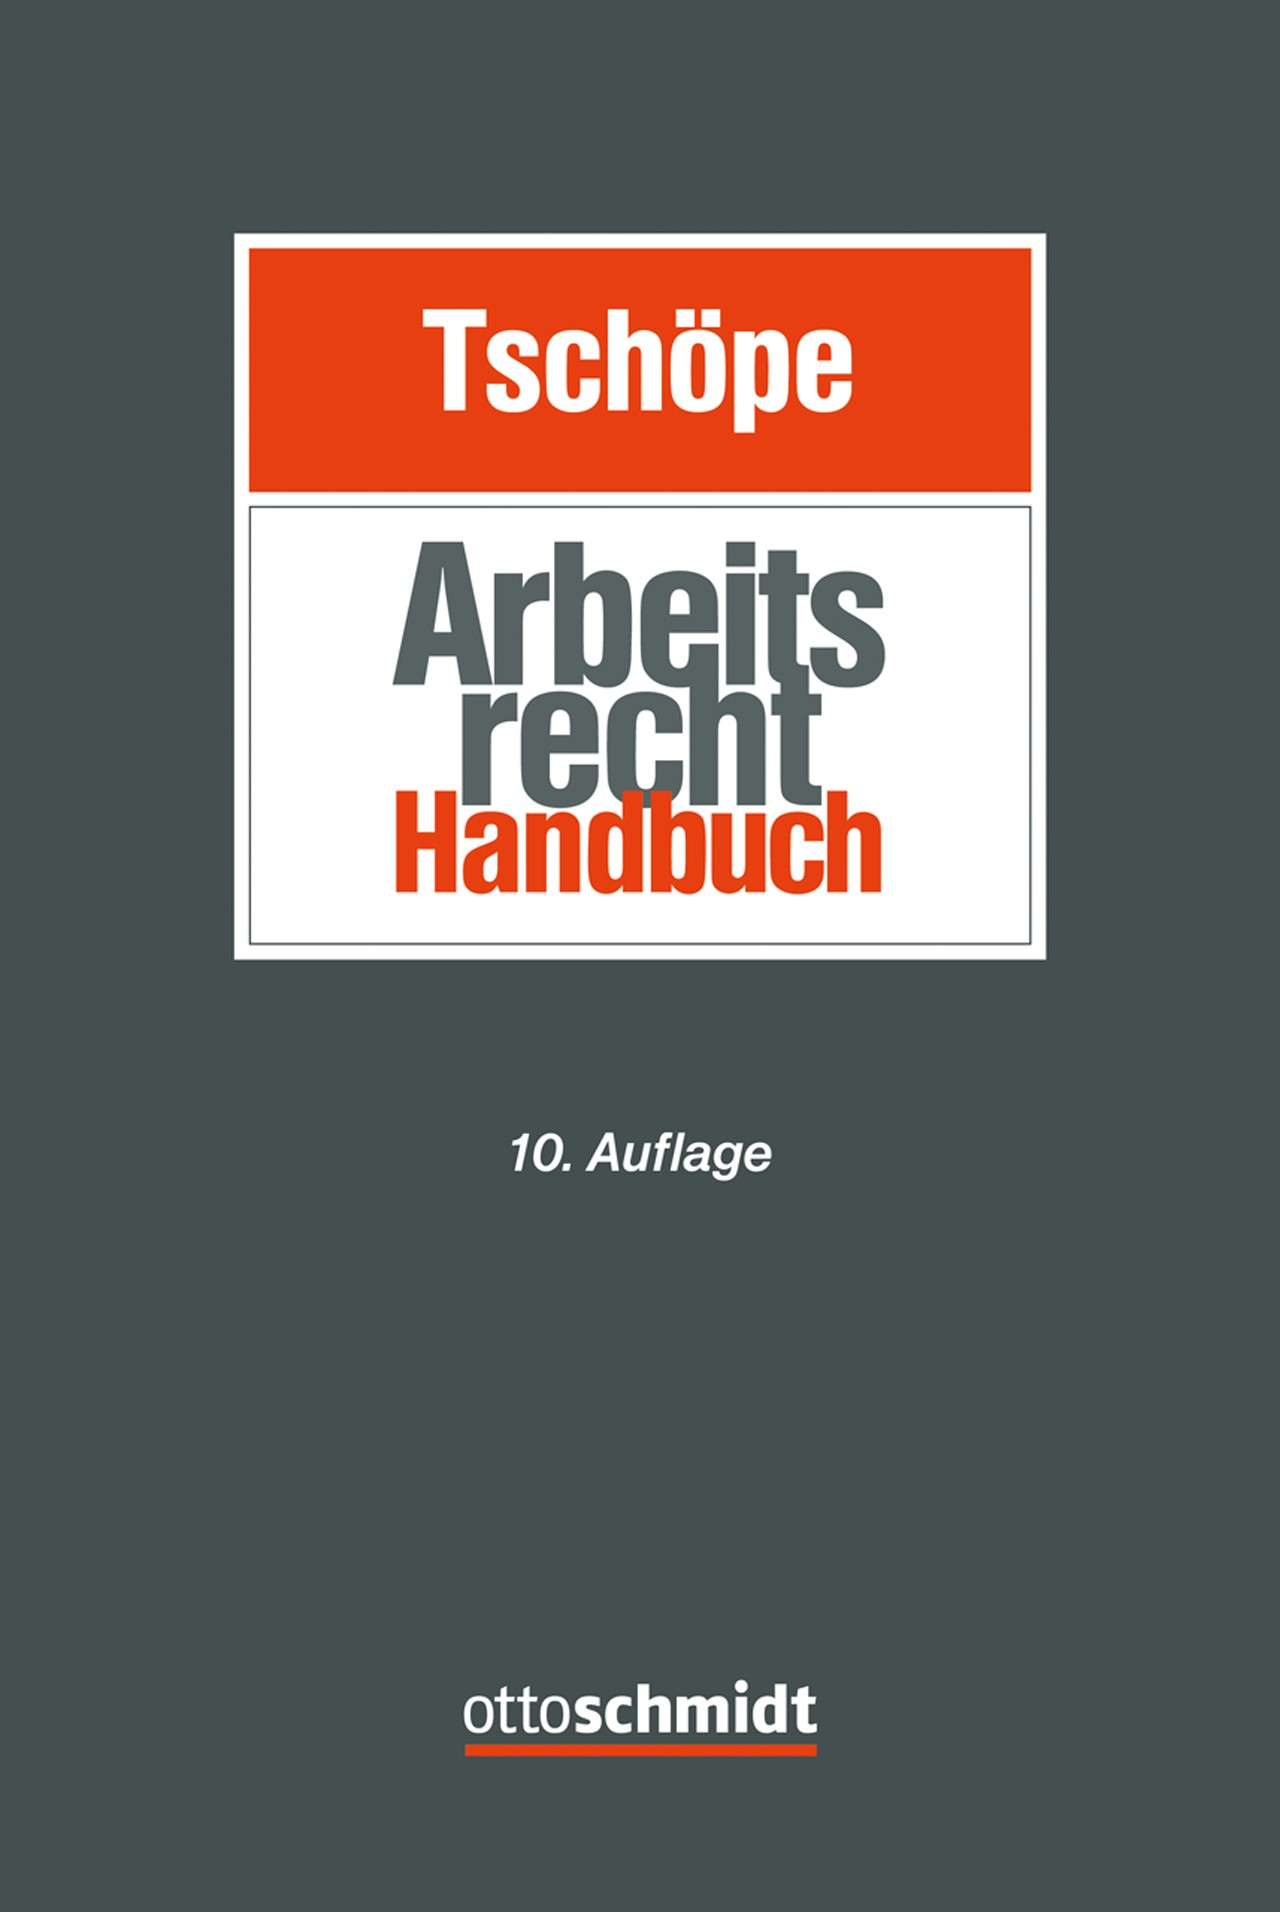 Arbeitsrecht Handbuch | Tschöpe | 10., neu bearbeitete Auflage, 2017 | Buch (Cover)